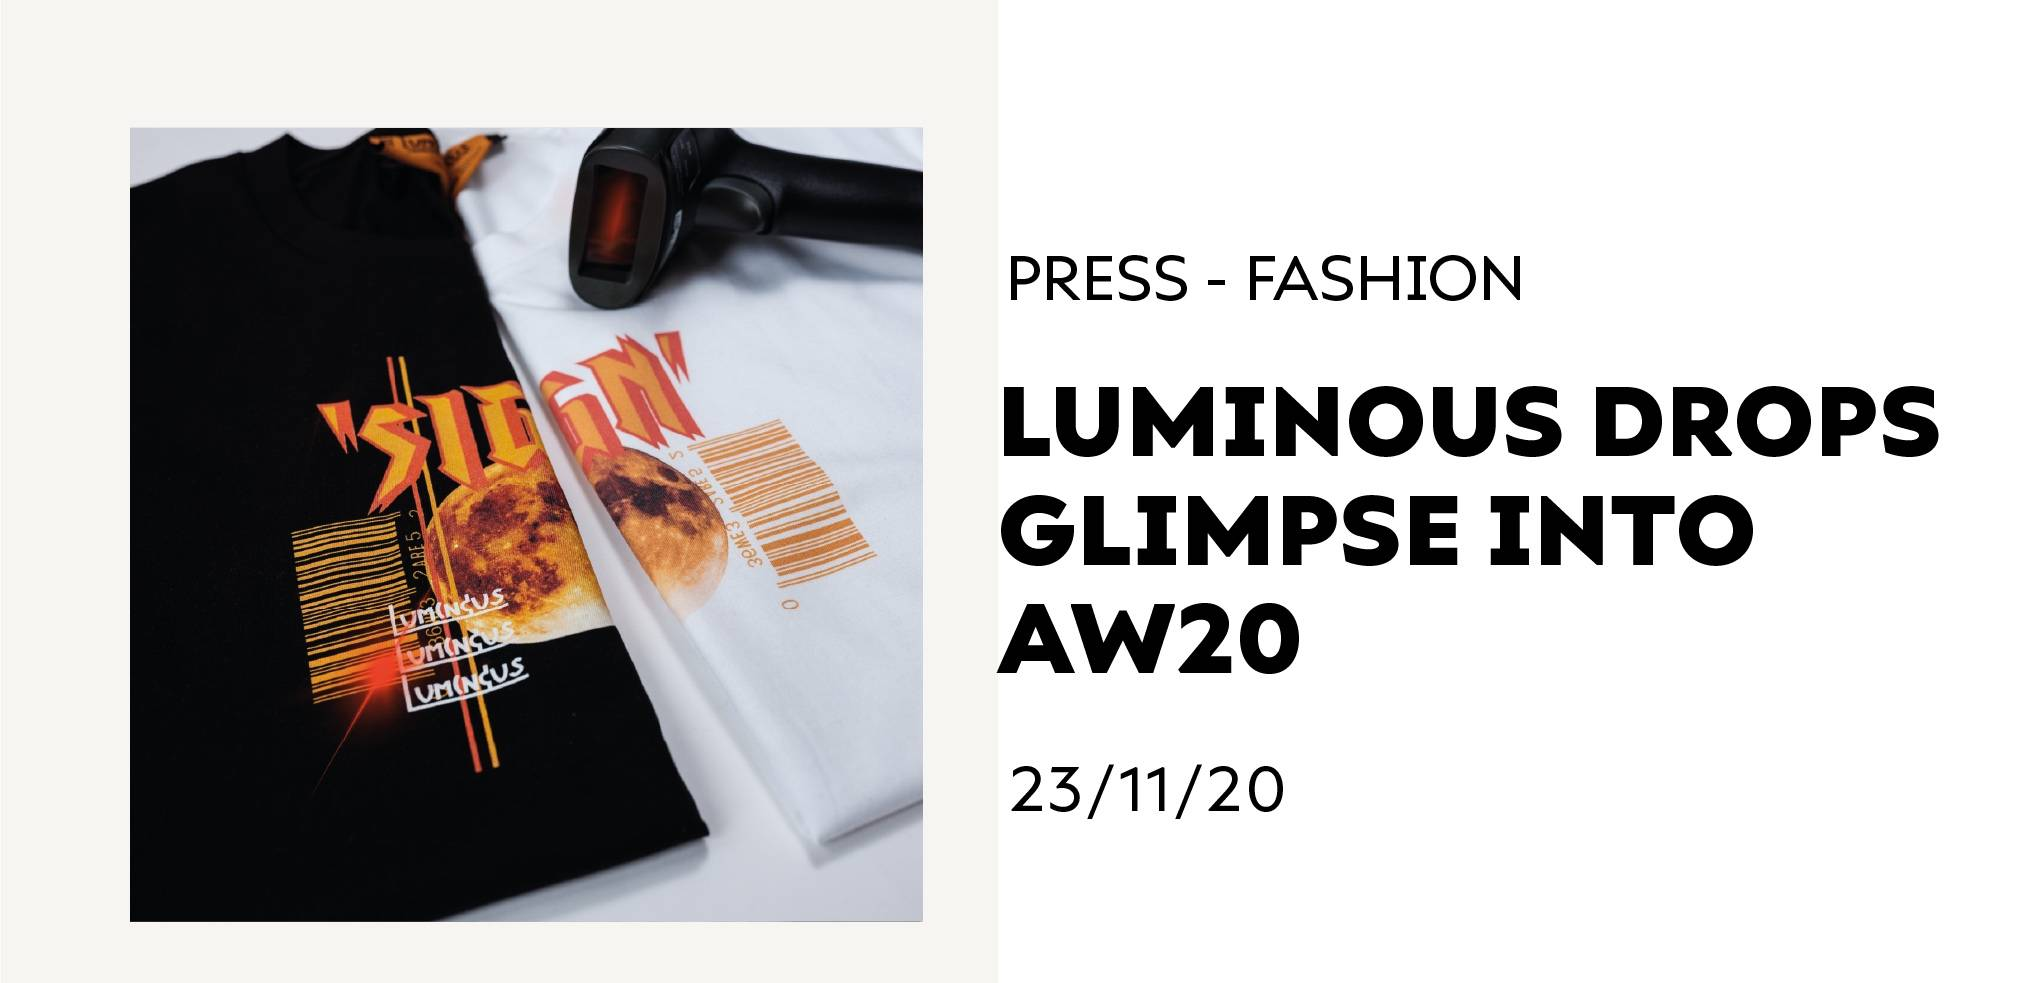 Luminous Drops Glimpse Into AW20